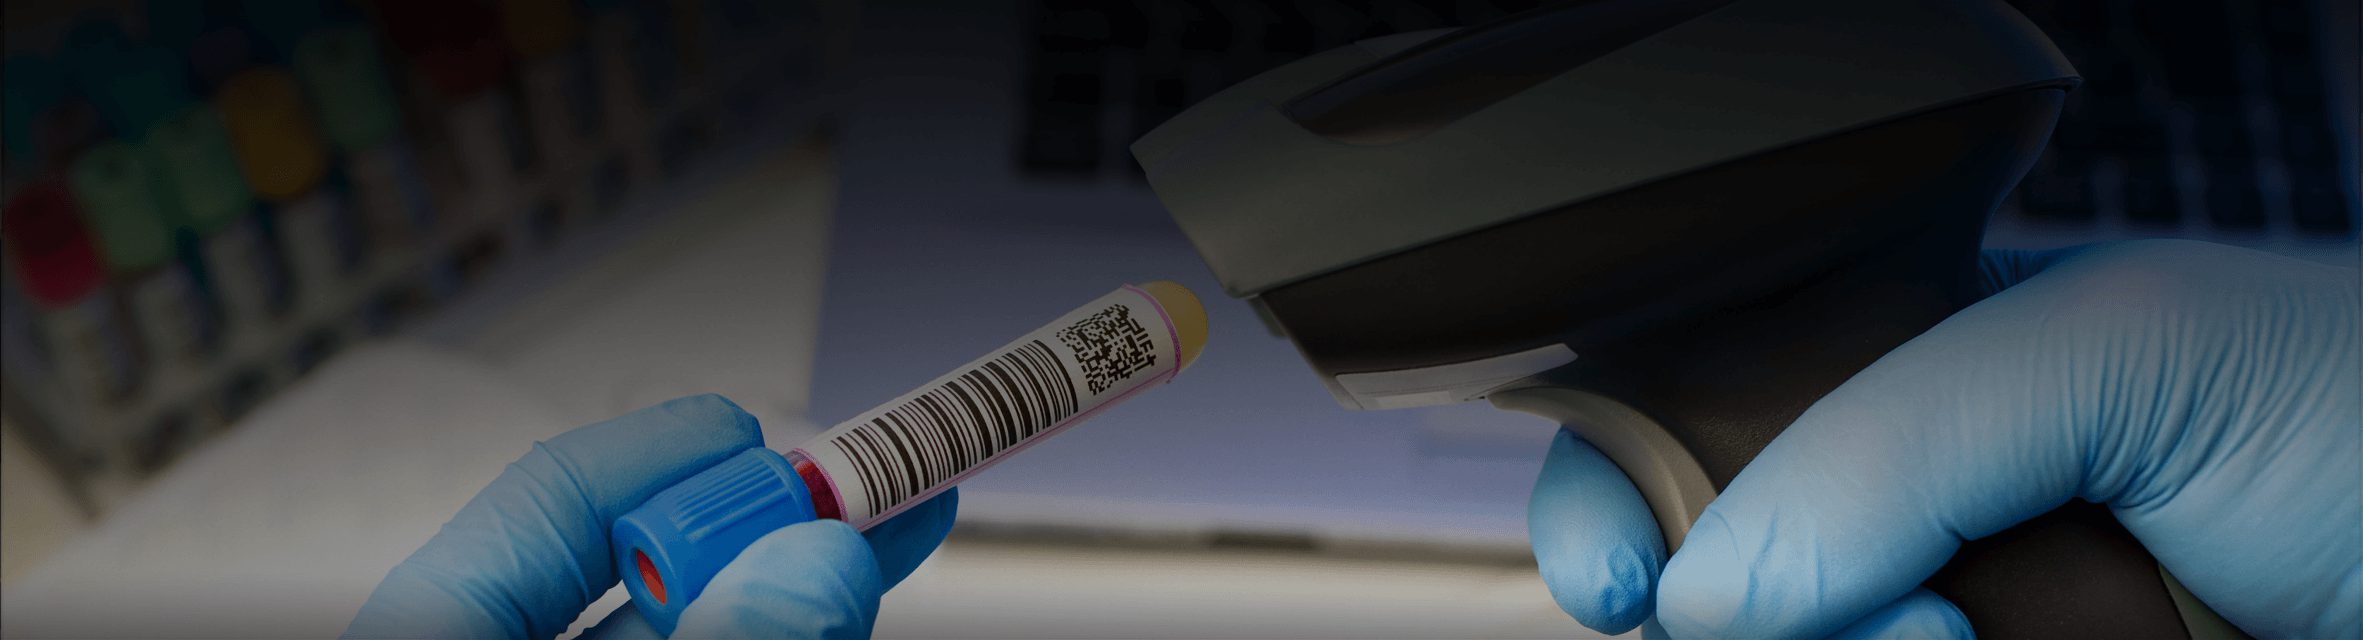 Medical RFID Testing